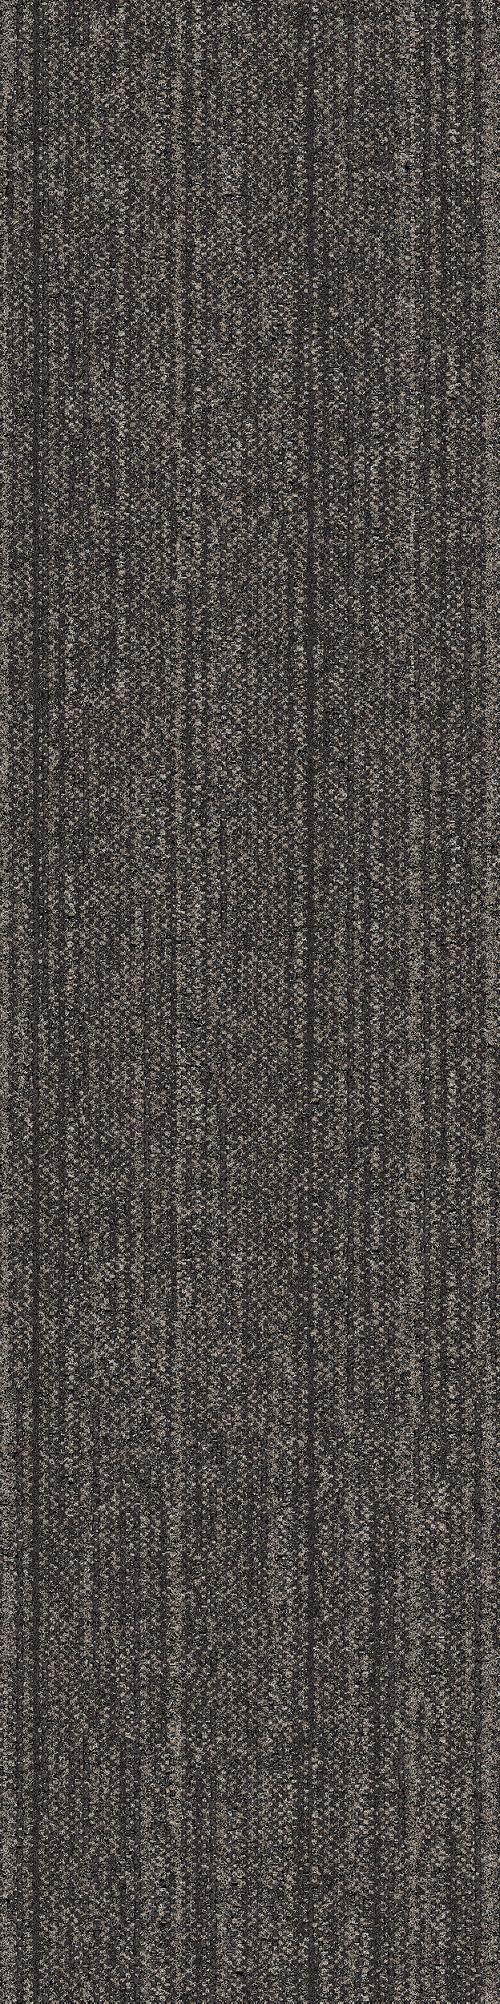 Interface carpet tile ww880 color name natural loom variant 1 interface carpet tile ww880 color name natural loom variant 1 baanklon Gallery